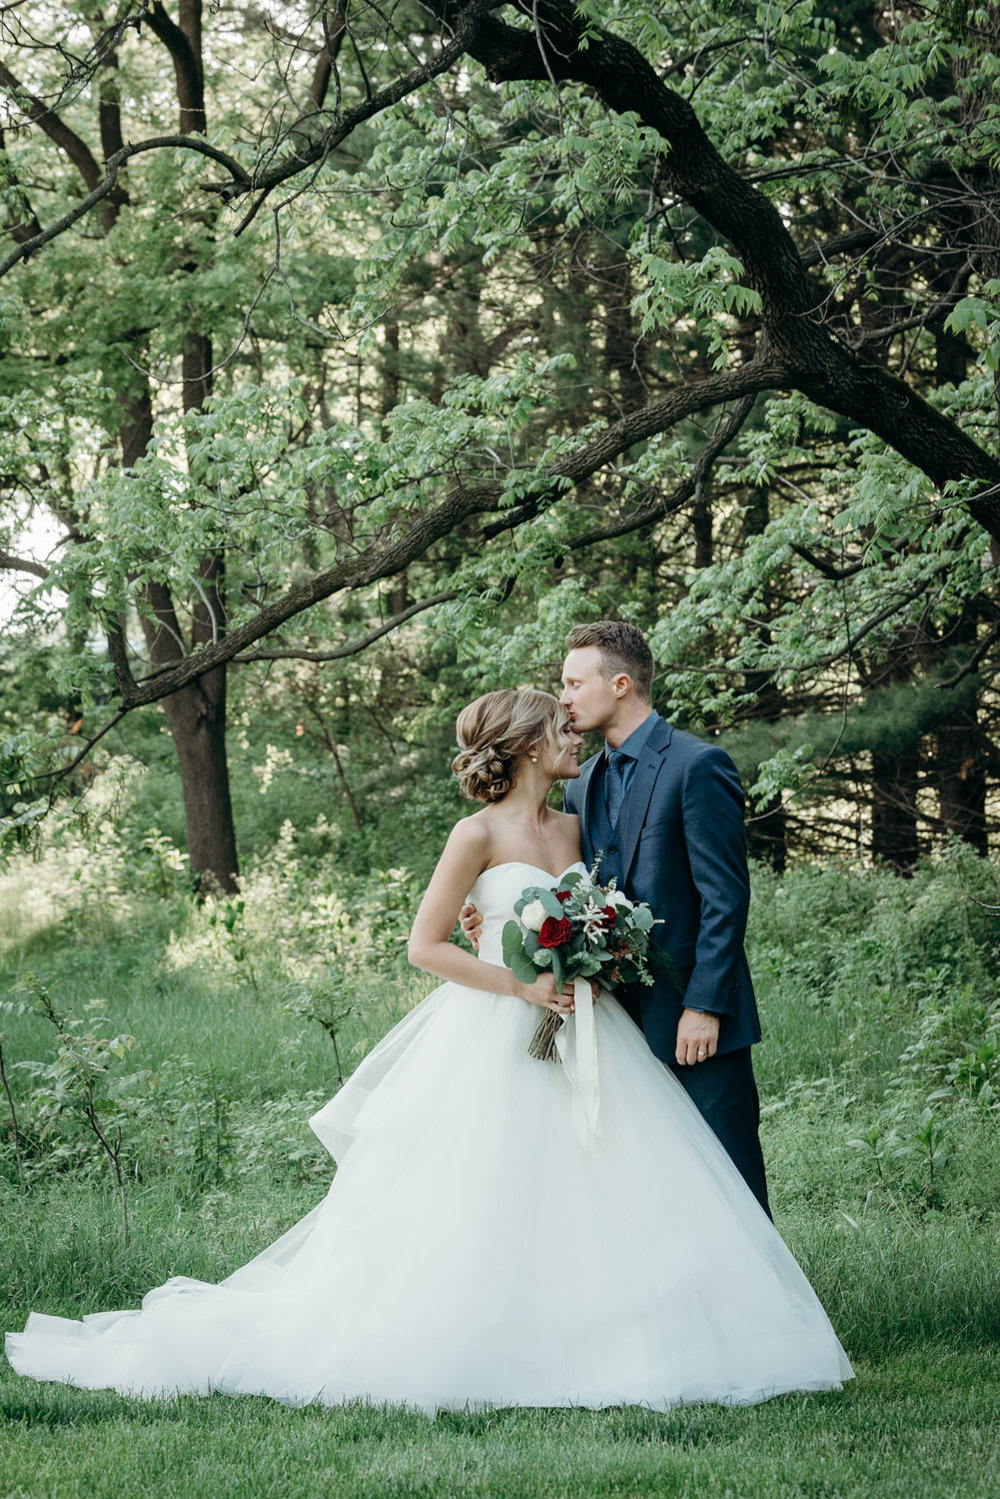 Grant Beachy wedding photographer Goshe, Elkhart, South Bend-054.jpg